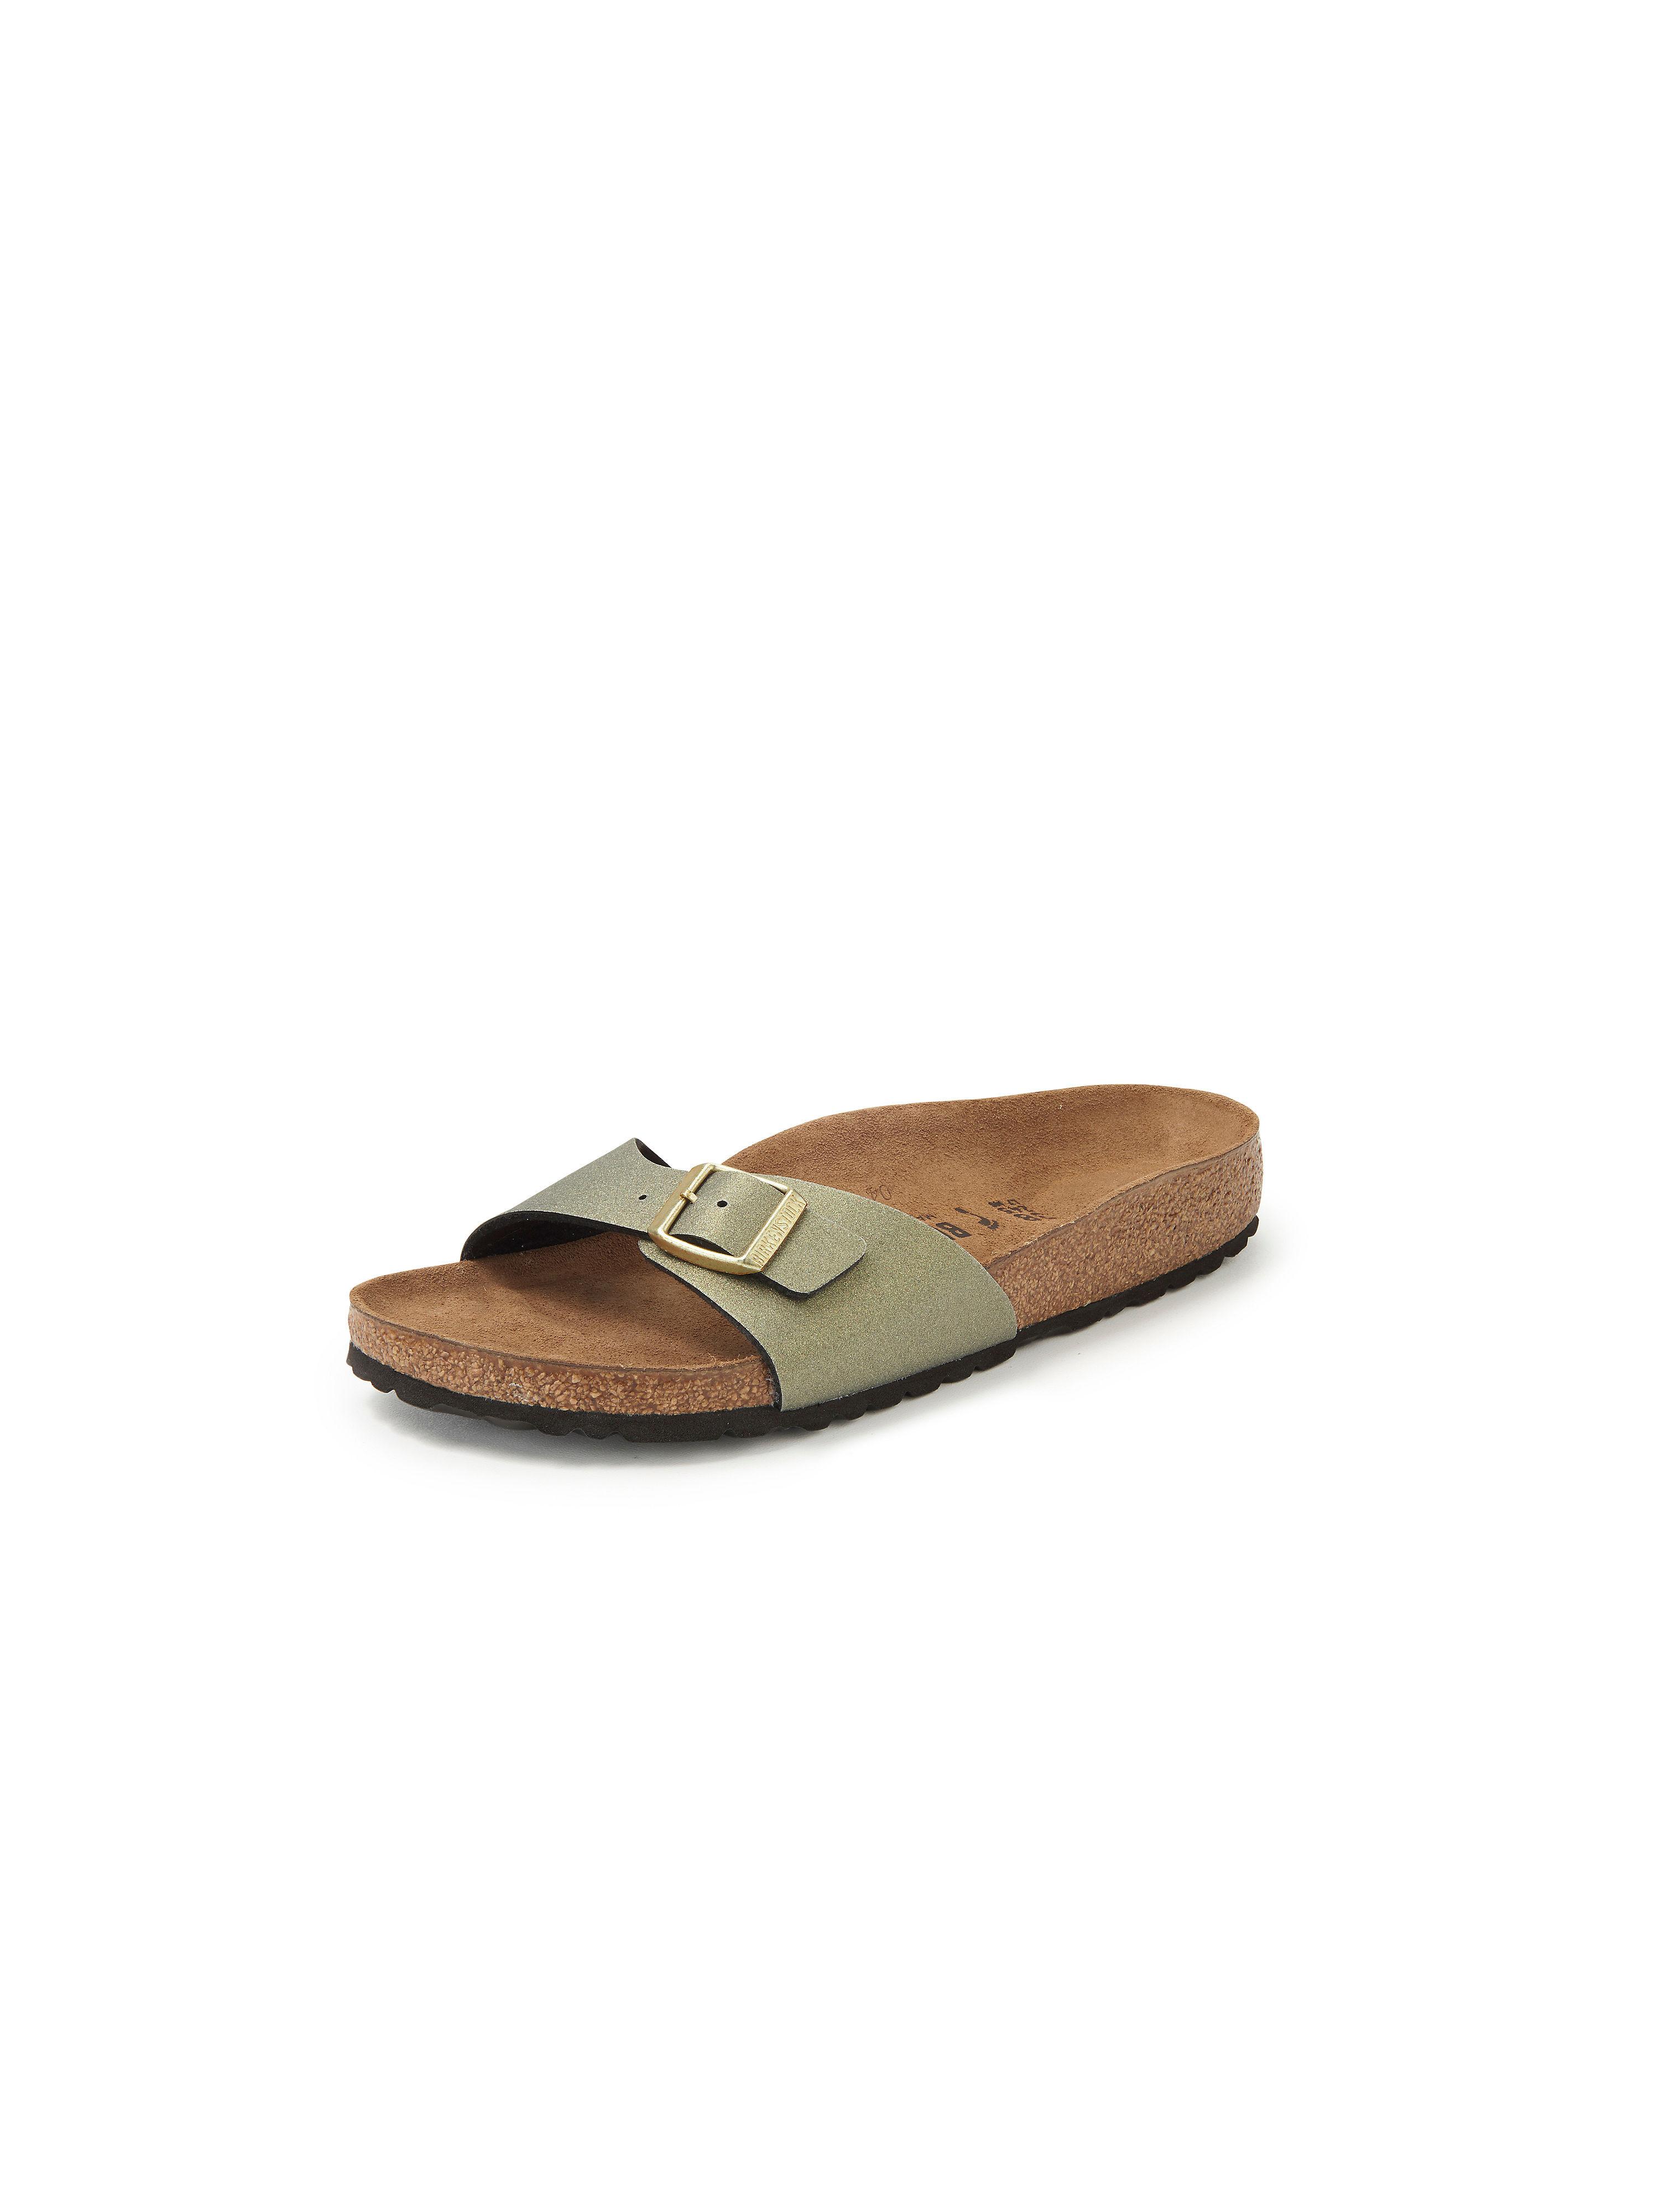 buy popular 6dcba 680d0 Schuhe online günstig kaufen über shop24.at   shop24